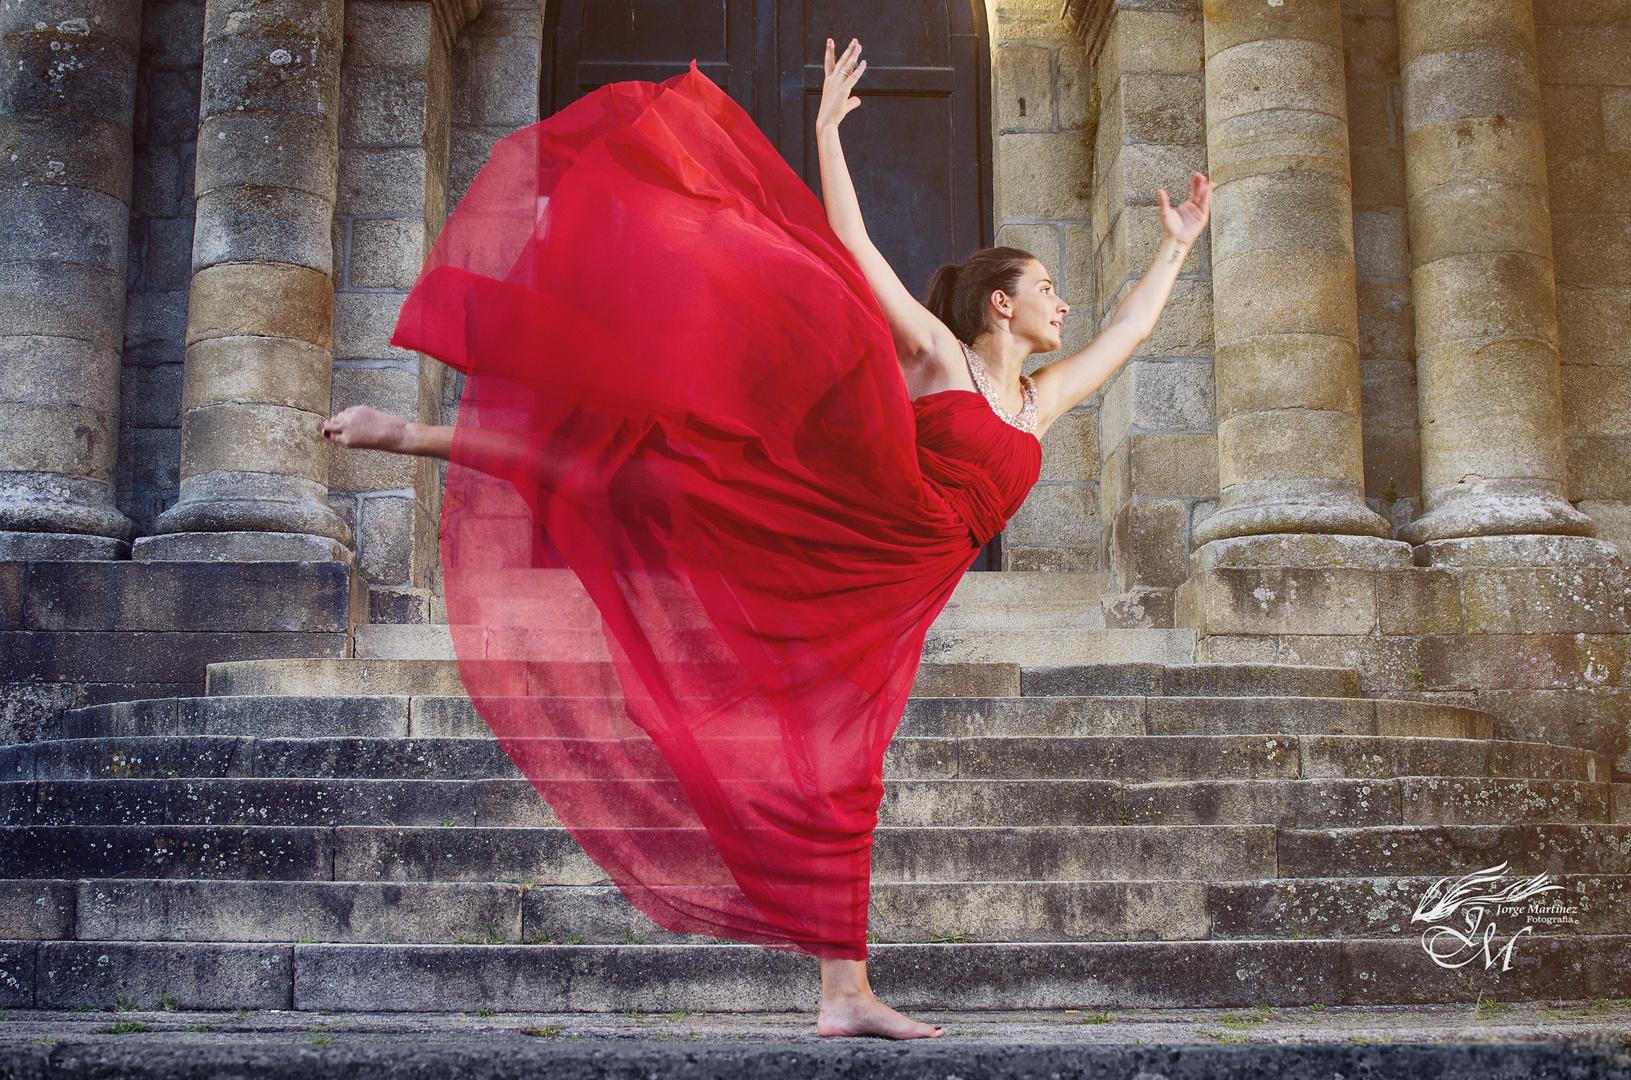 Bailar es el lenguaje secreto del alma